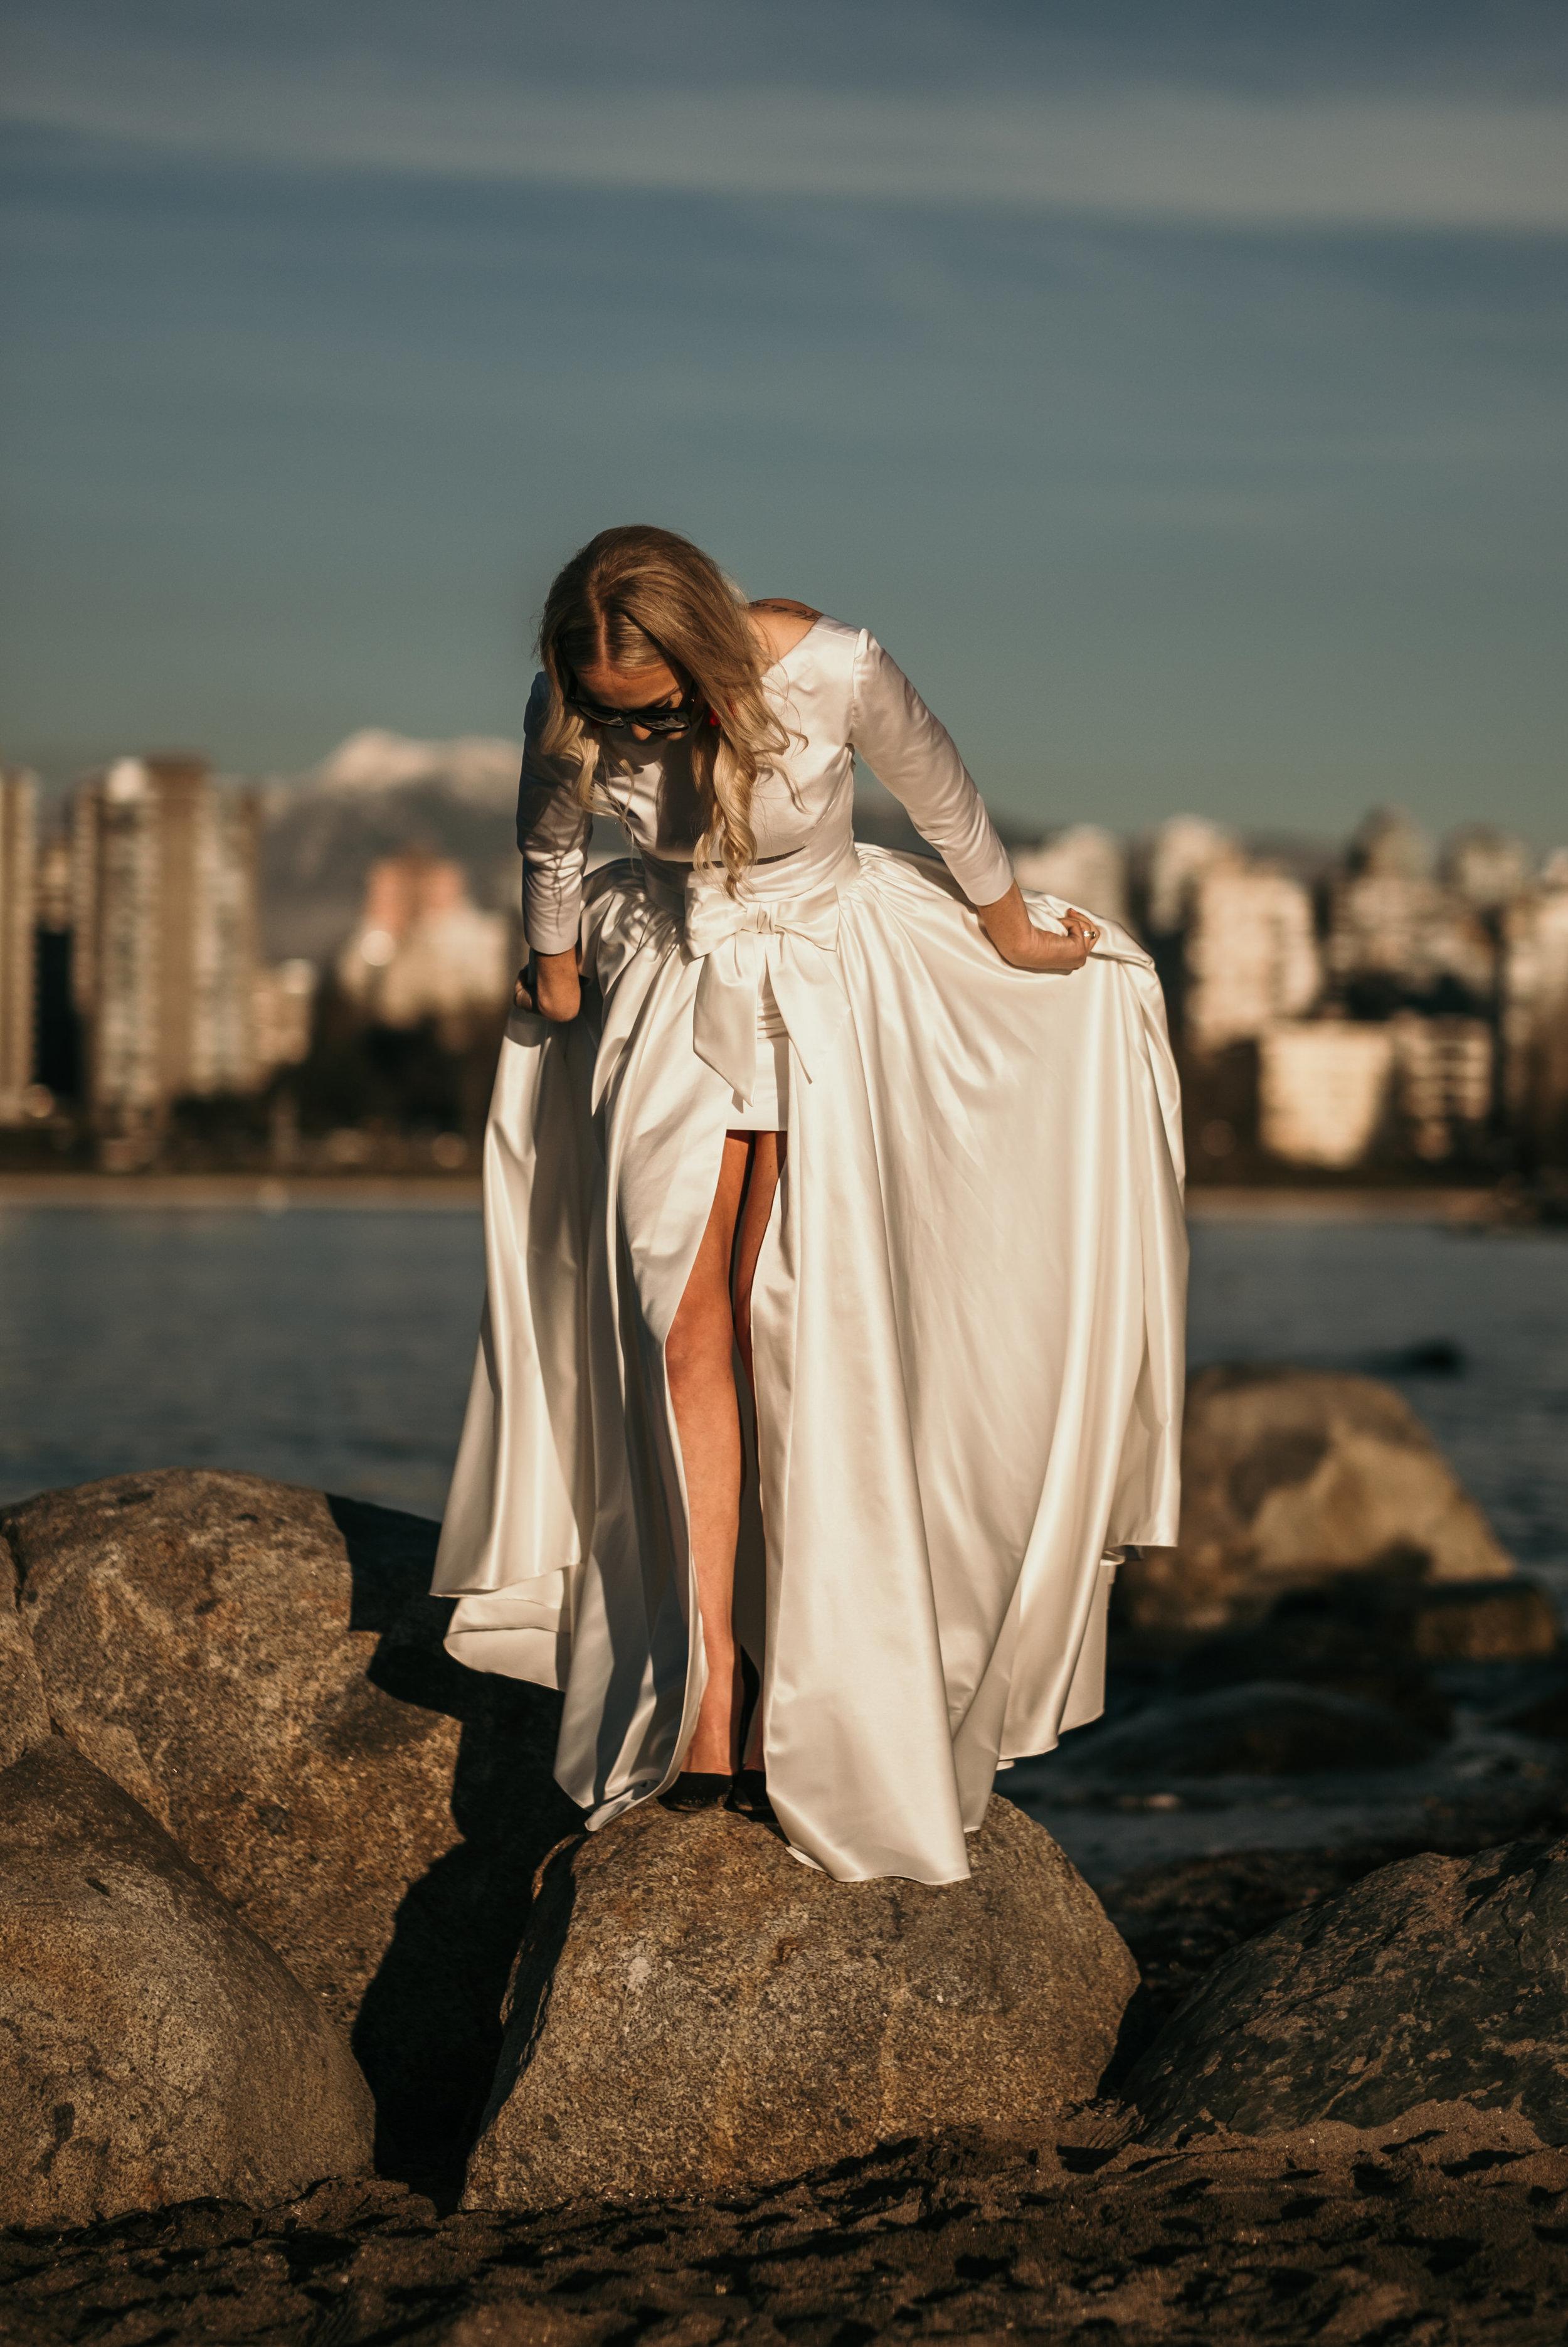 Vancouver Wedding Photos - Vegan Wedding Photographer - New Years Eve Wedding Photos - Vancouver Wedding Photographer - Vancouver Wedding Videographer - 737.JPG